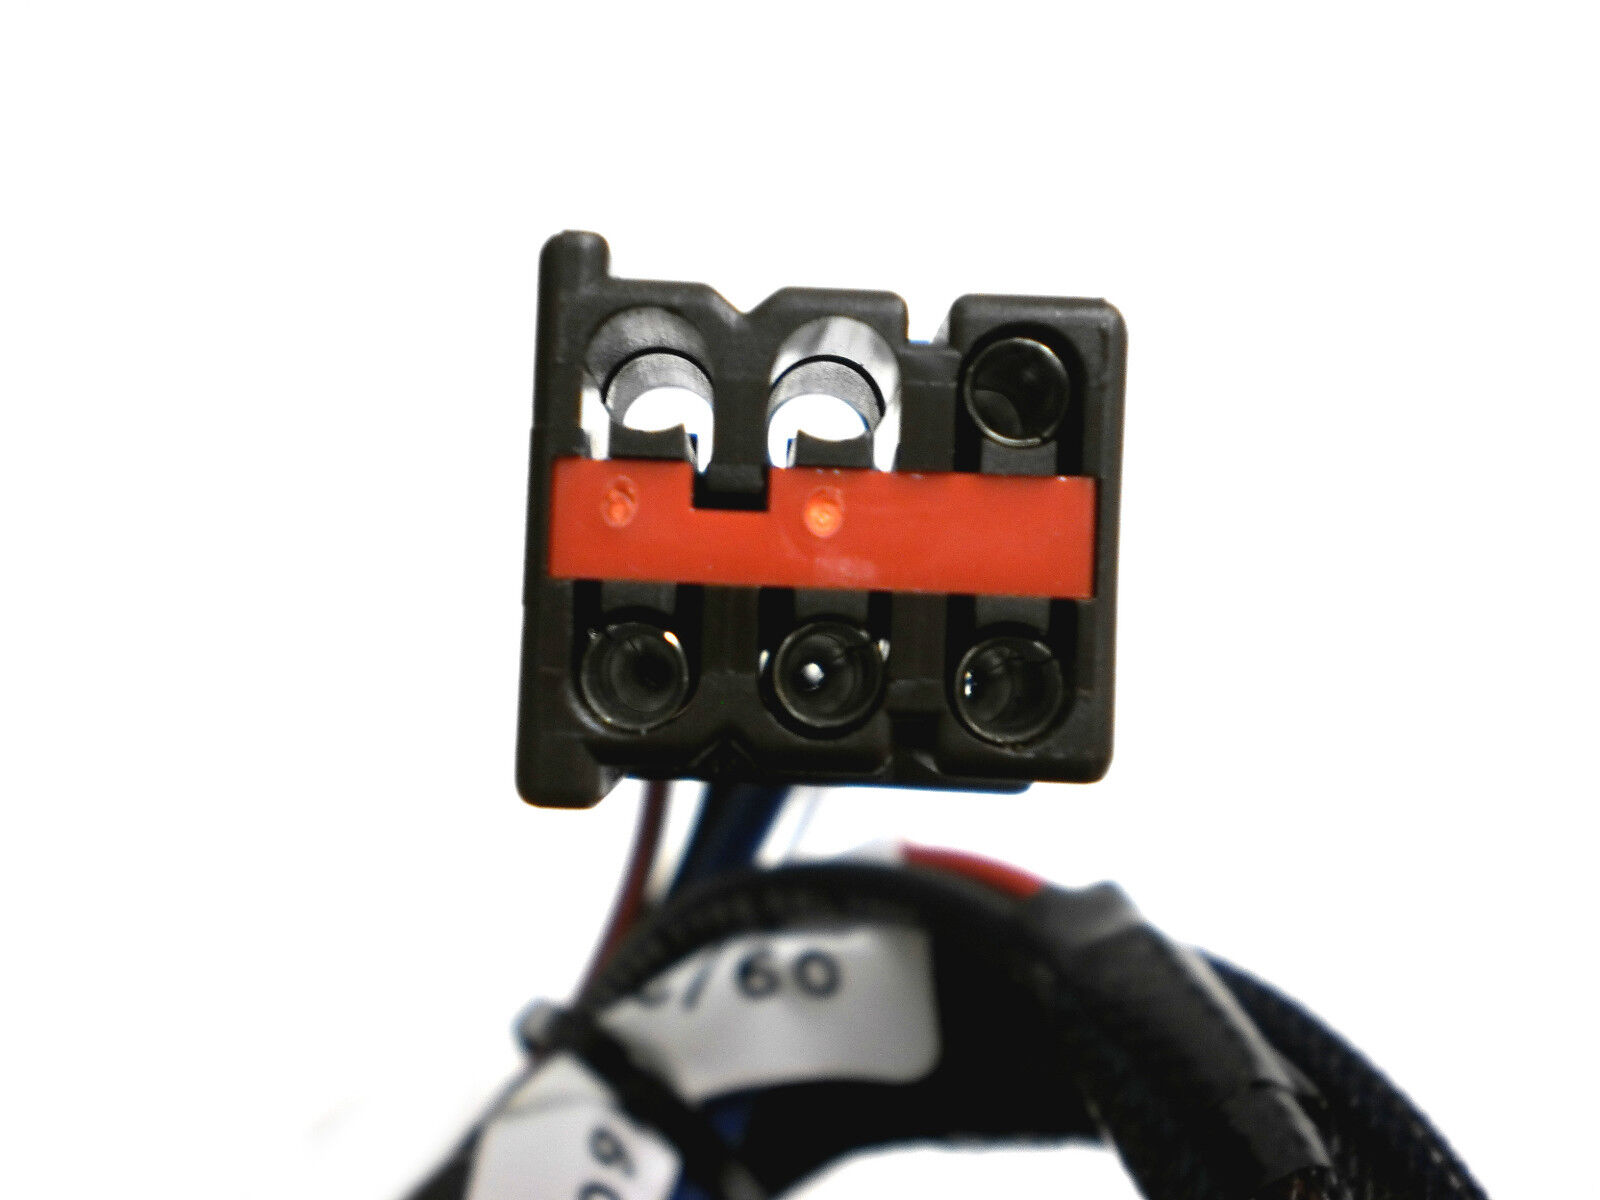 tekonsha prodigy p2 trailer brake controller wiring diagram ewiring 2017 tacoma tekonsha prodigy p2 trailer brake controller install